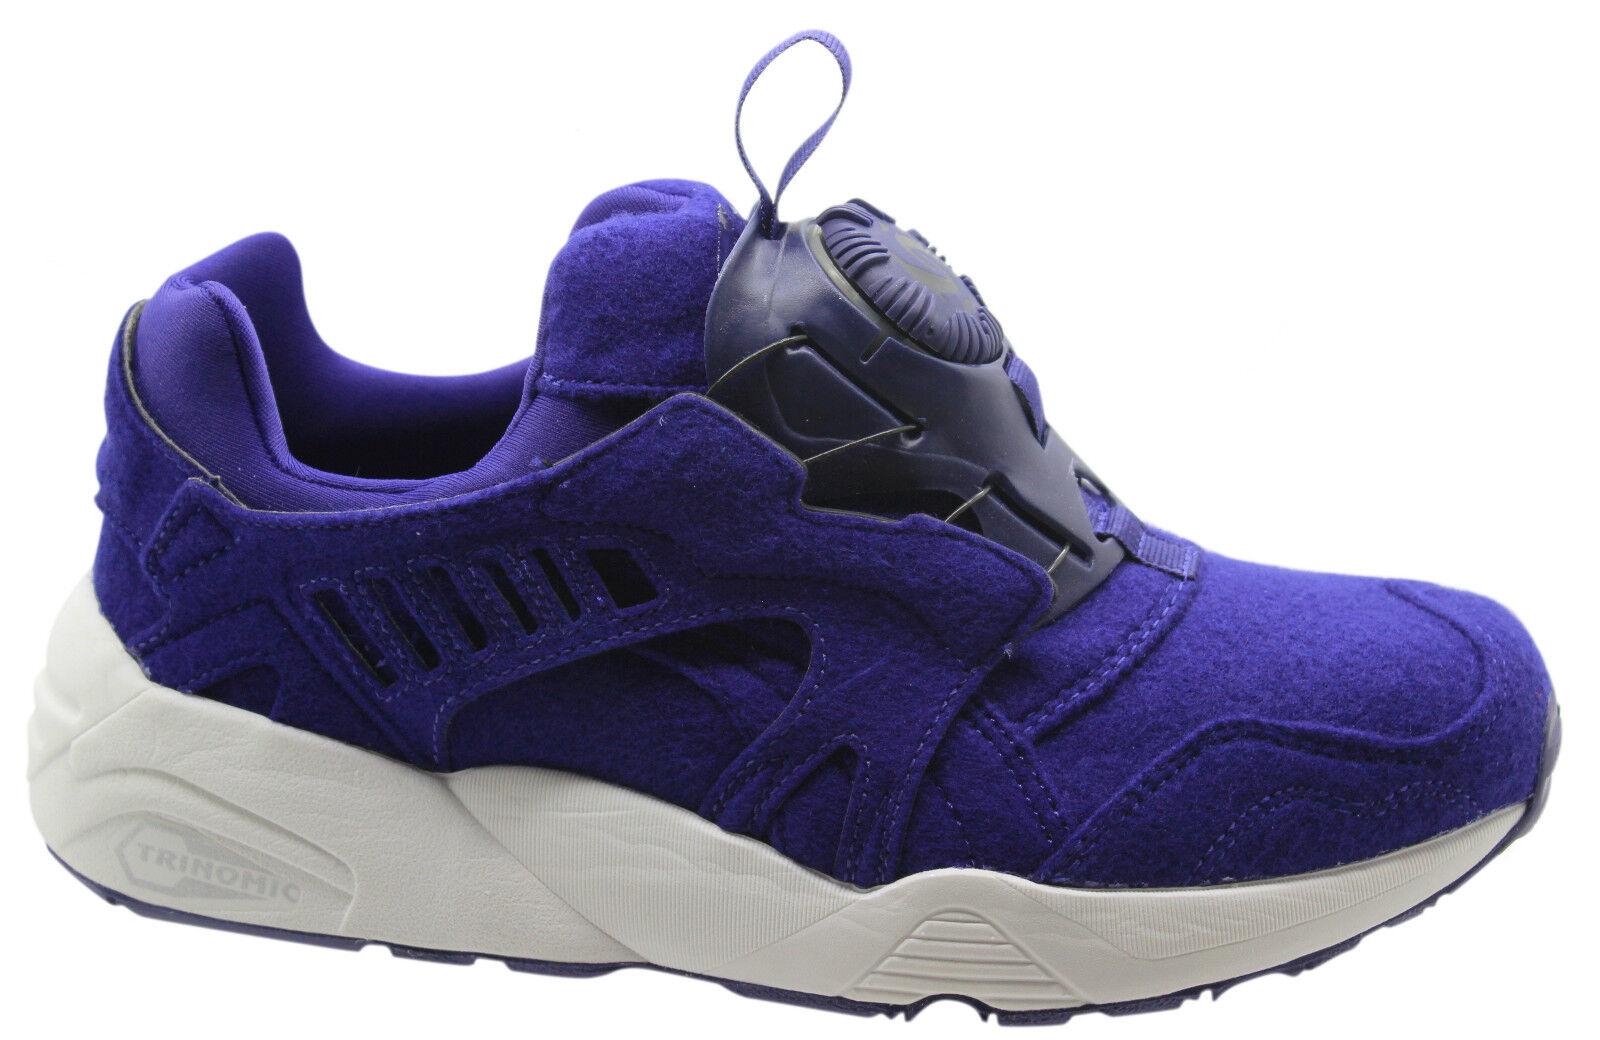 puma trinomic disc blaze purple felt mens trainers slip on. Black Bedroom Furniture Sets. Home Design Ideas